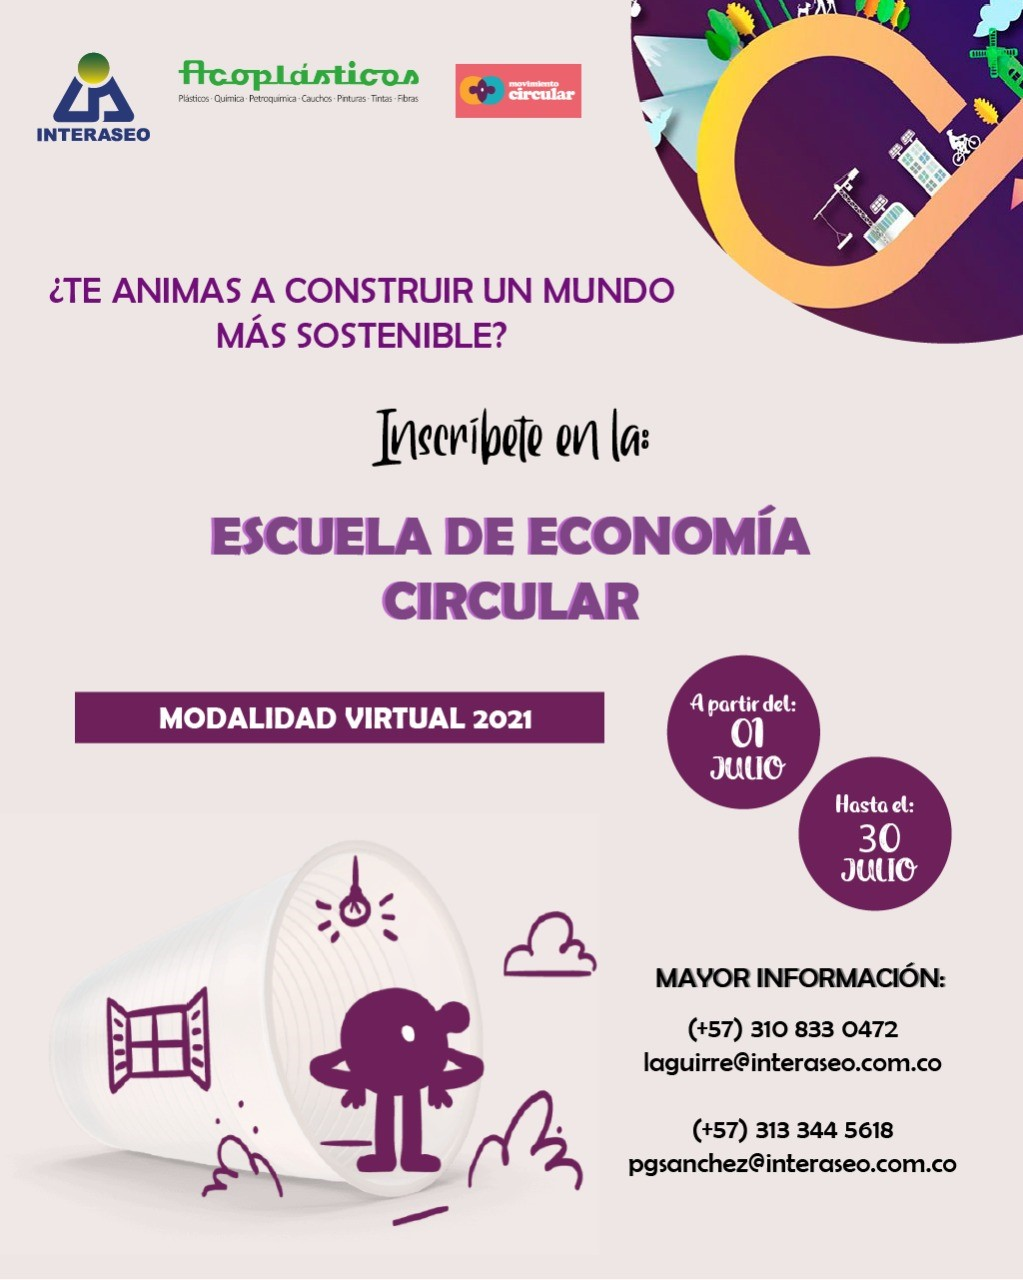 escuela-de-economia-circular